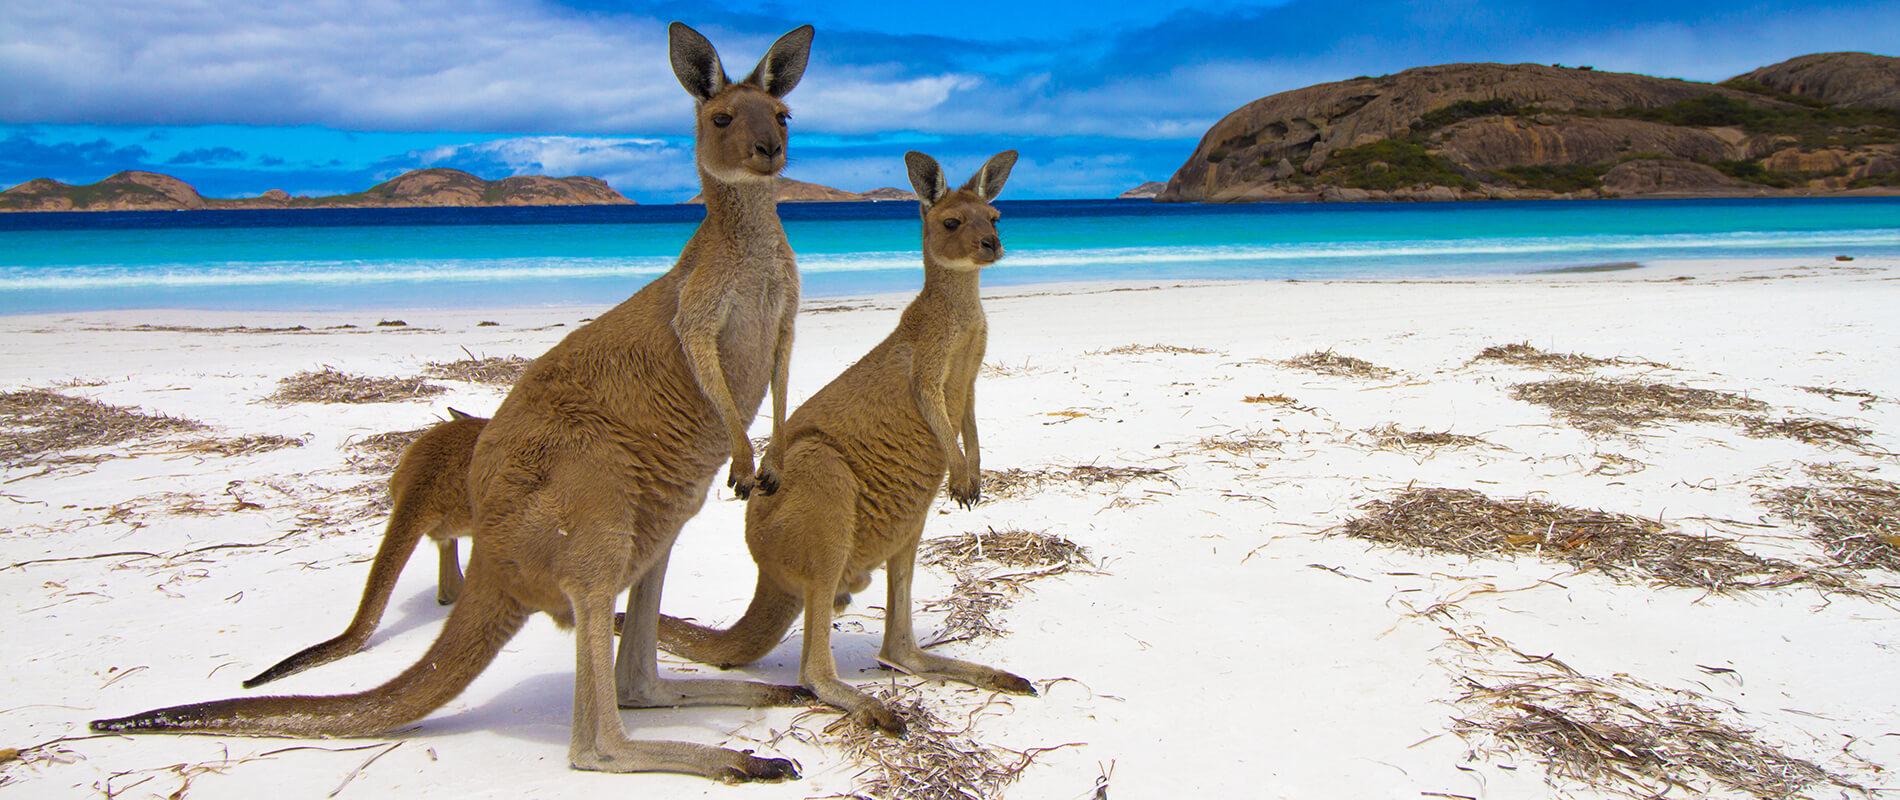 Kangaroo Island, oasi incontaminata dell'Australia del Sud